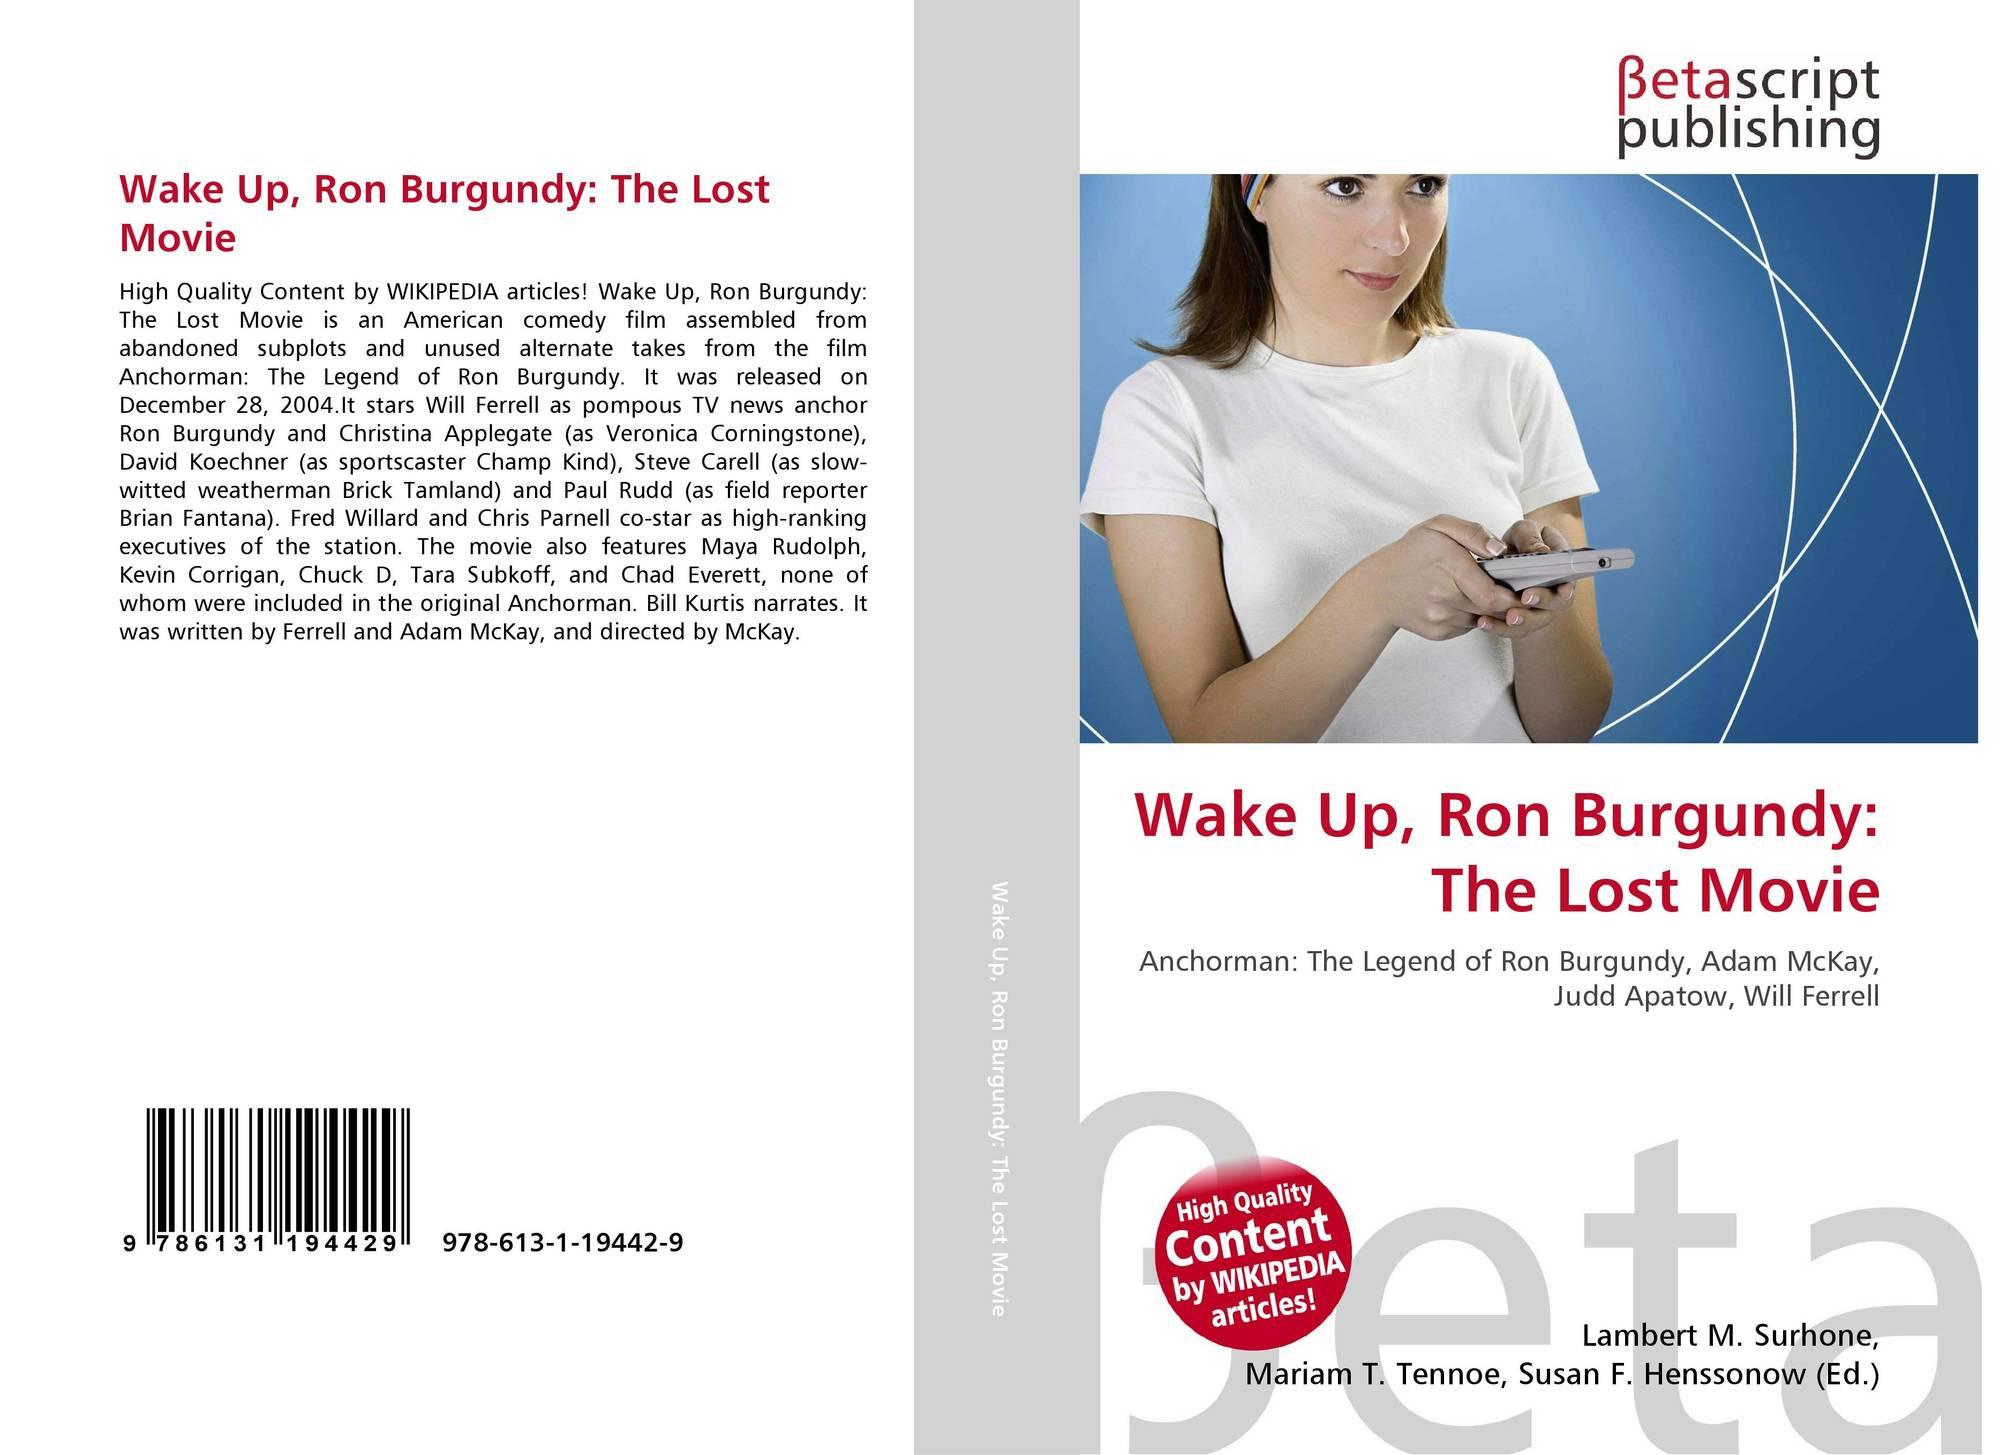 Wake Up Ron Burgundy The Lost Movie  Wikipedia